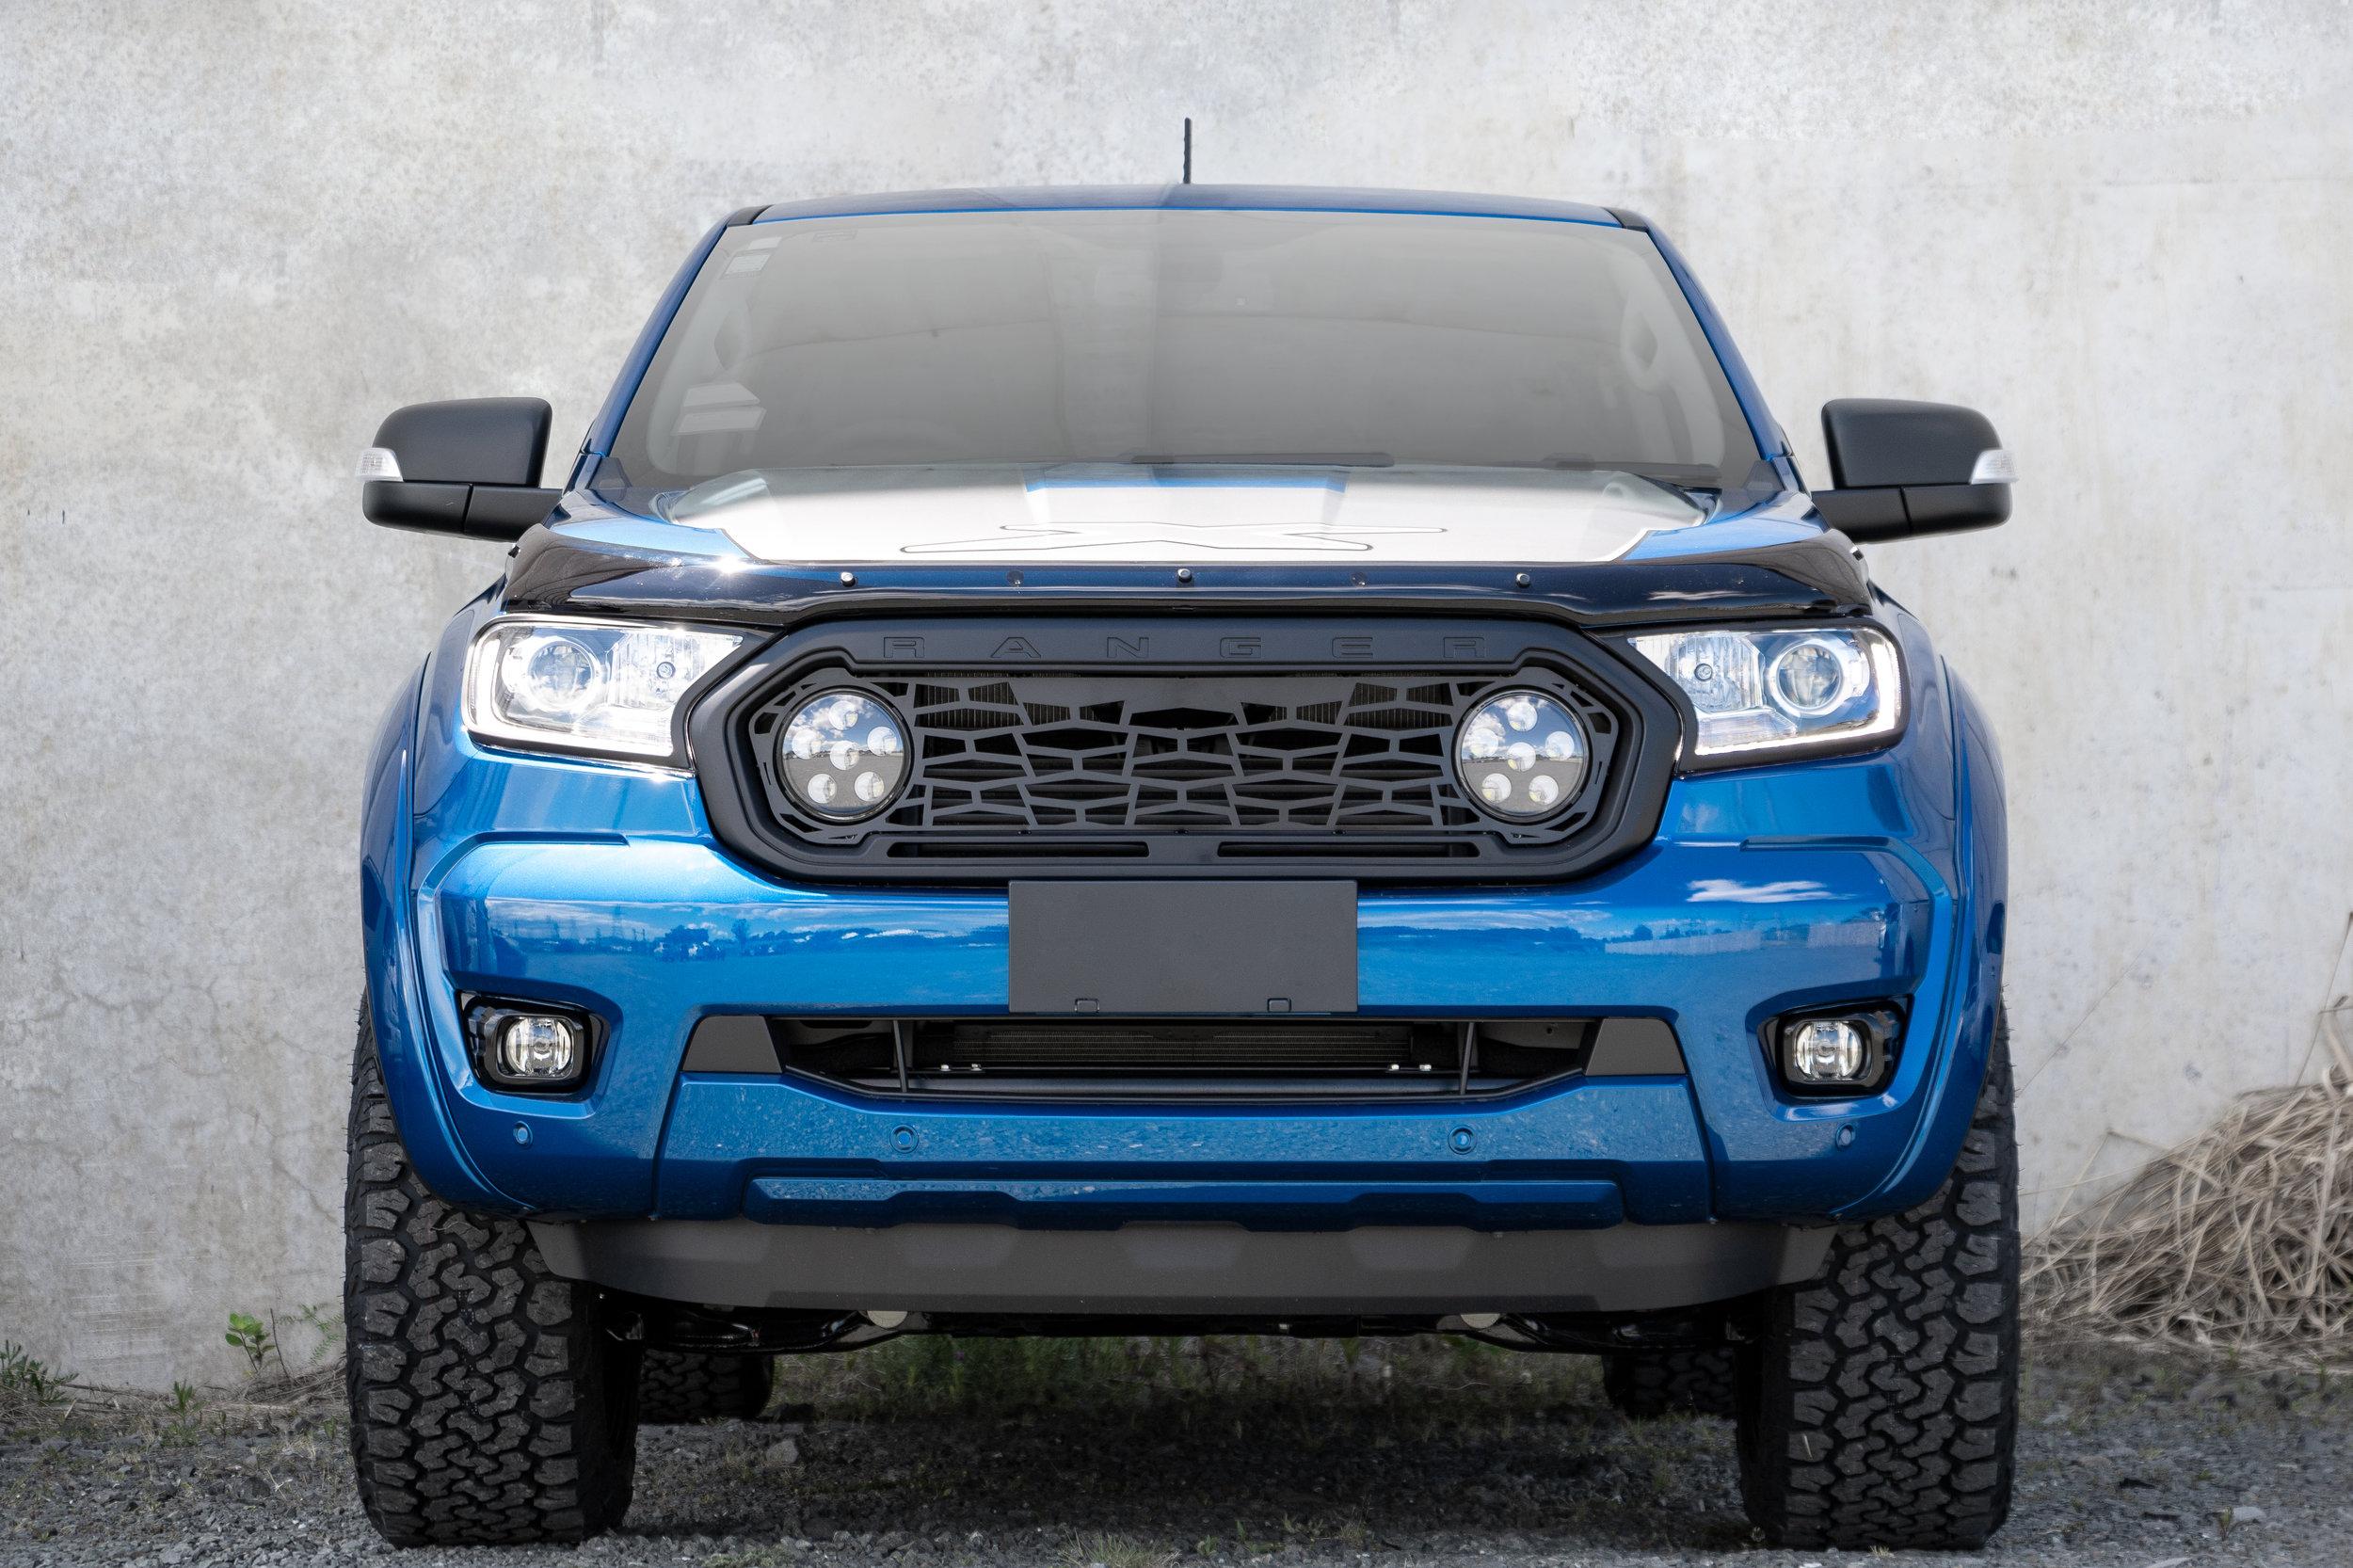 RVE-Ford-Ranger-Grille-Mesh-Upgrade-with-Spot-Lights-1.jpg